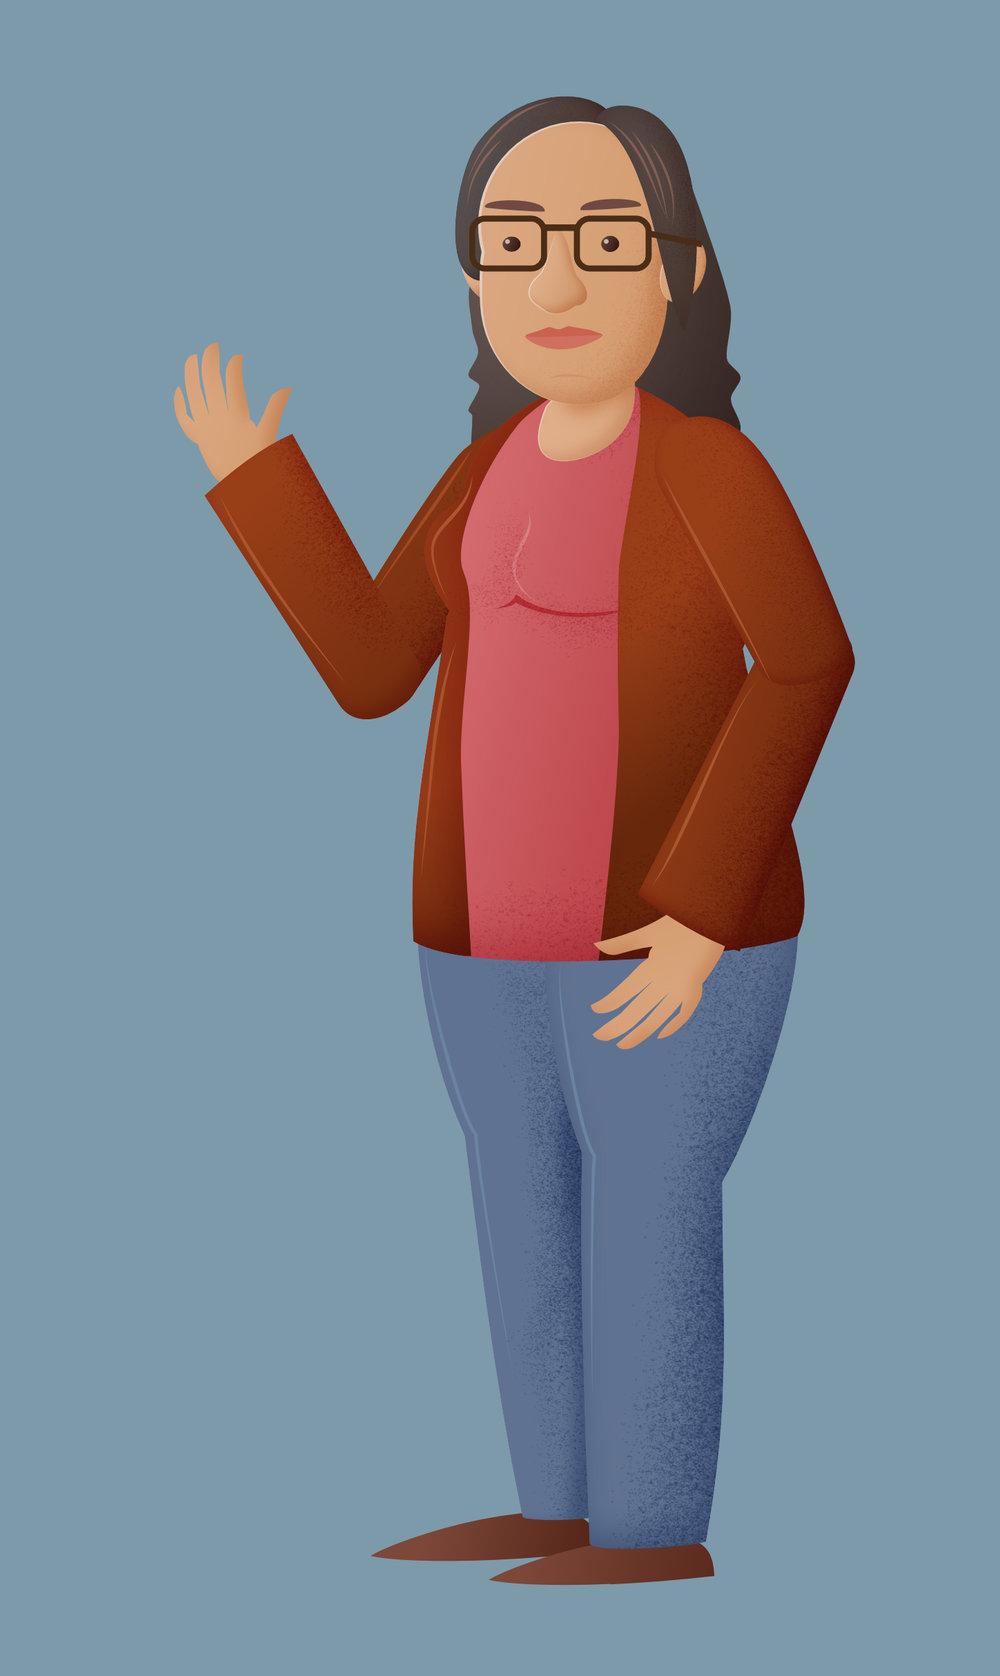 character design_pacific woman hello.jpg